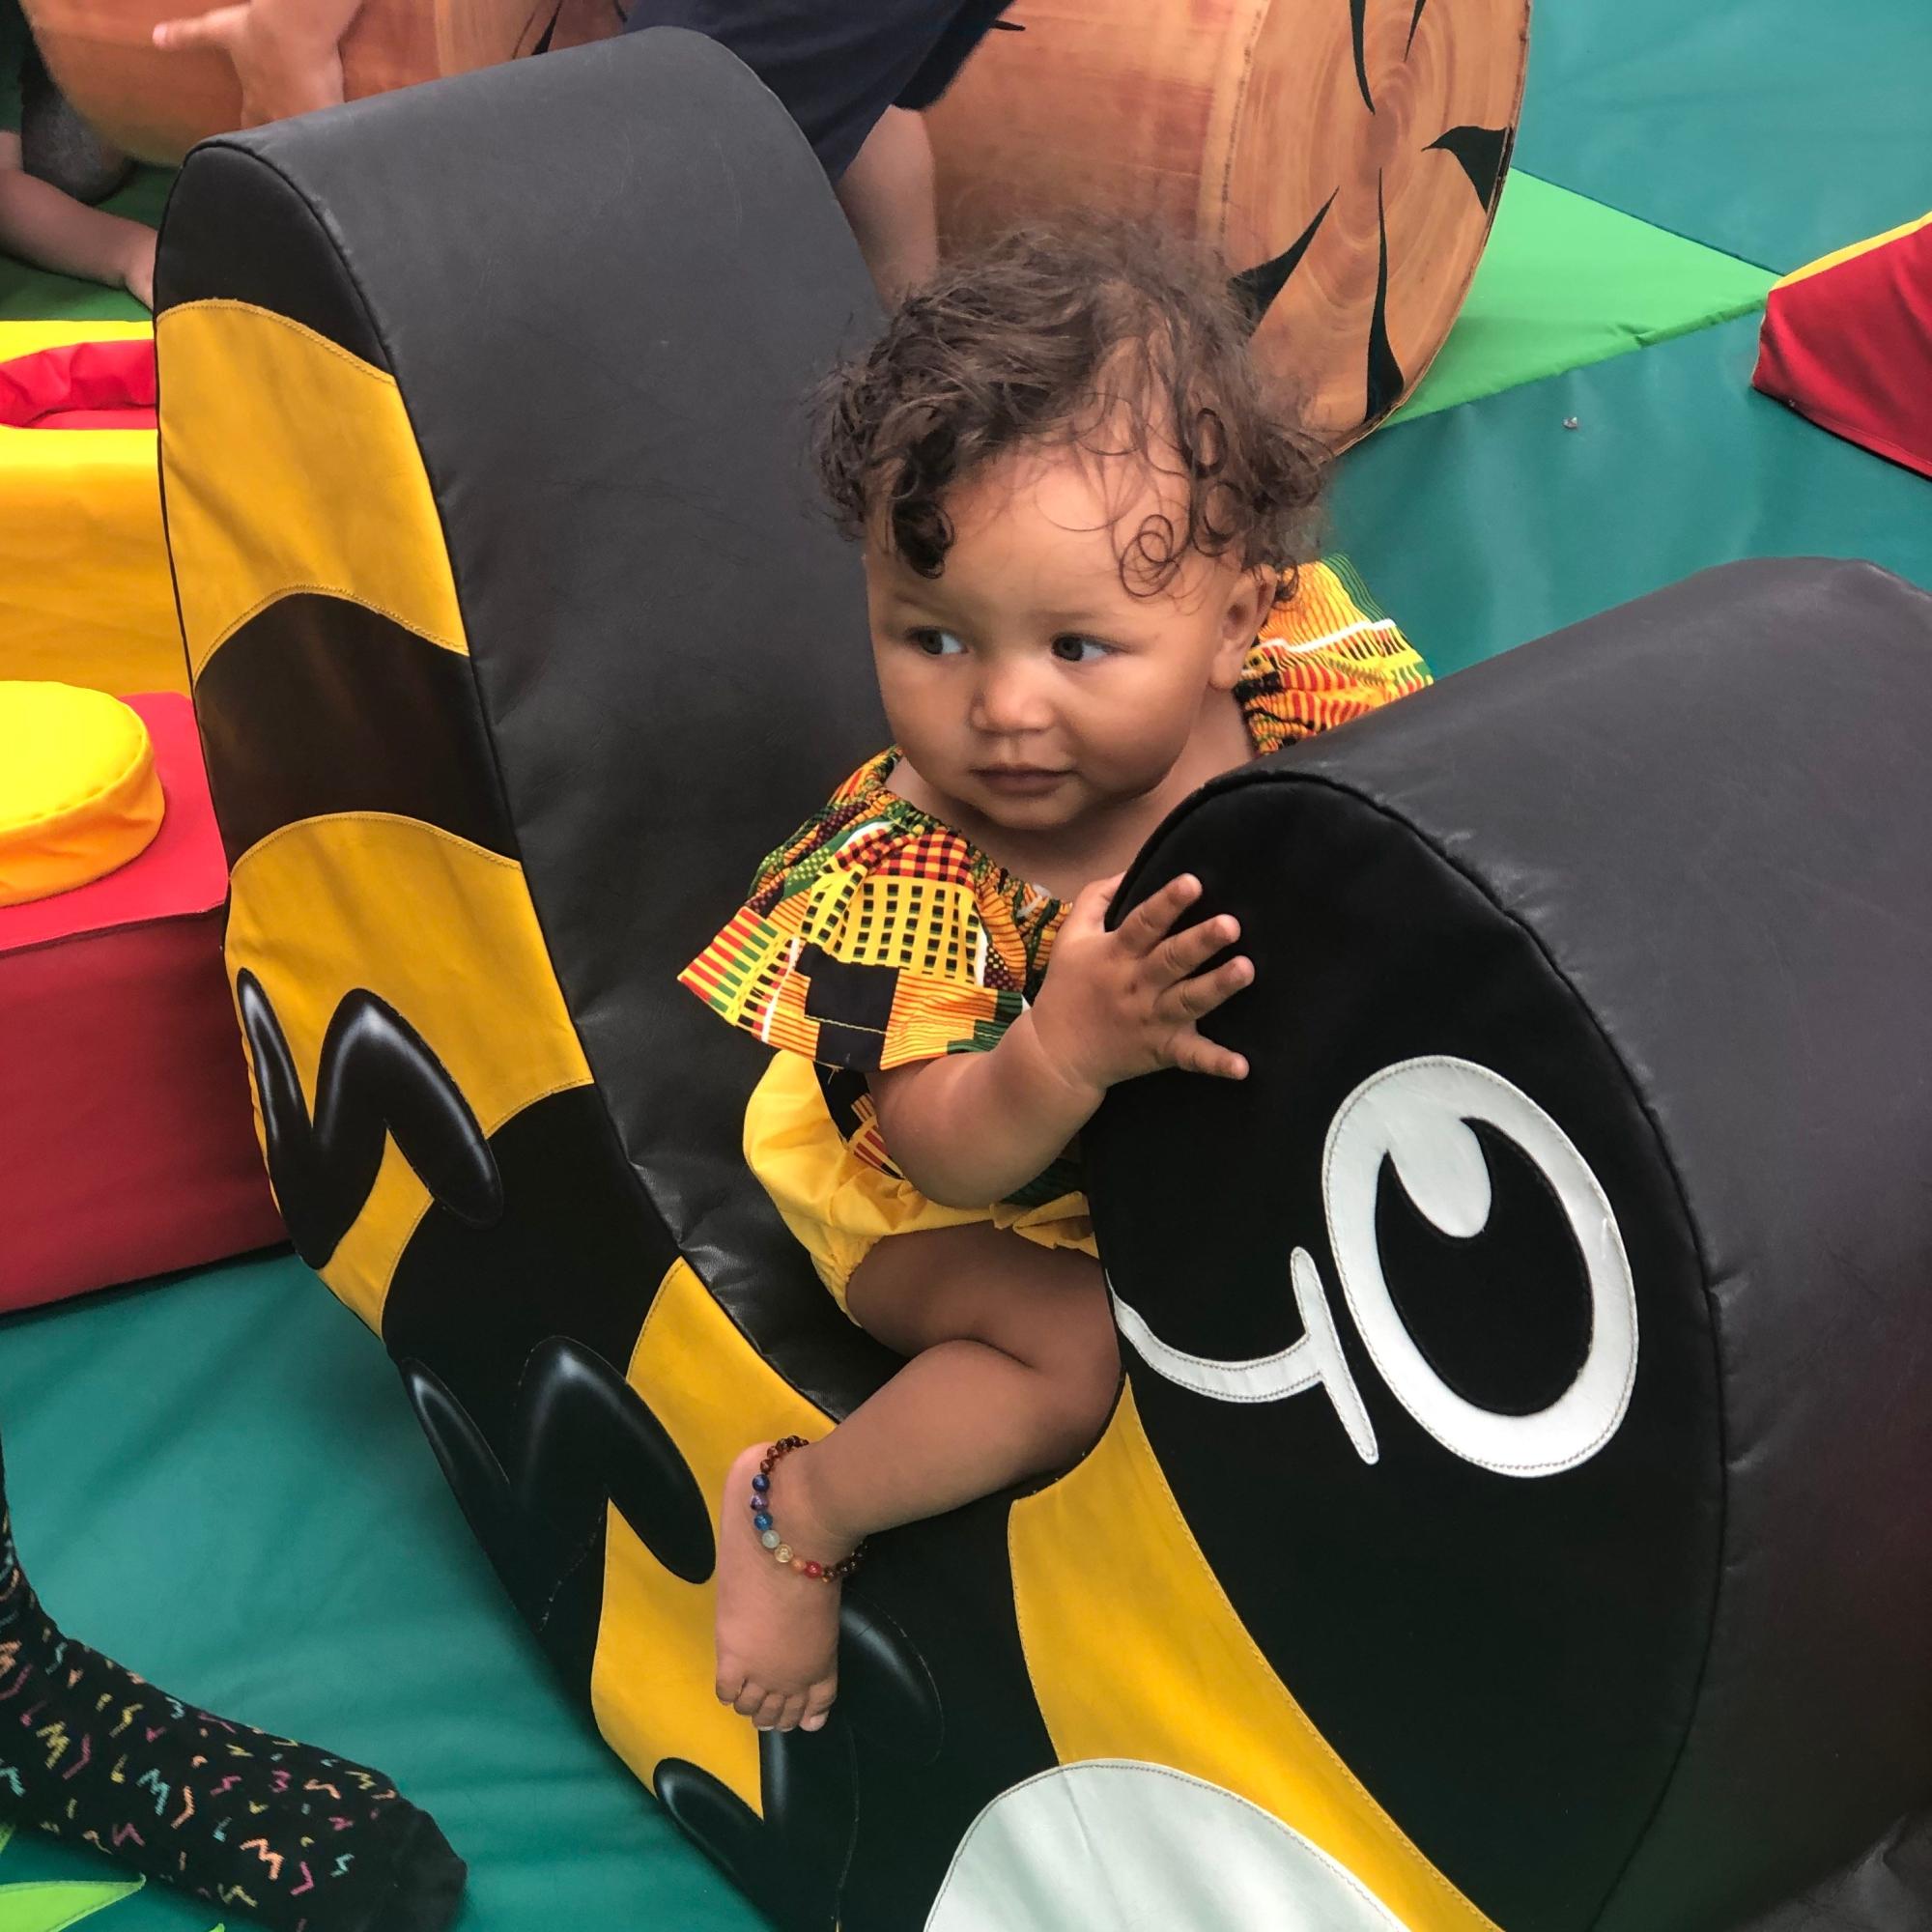 Mixed race baby